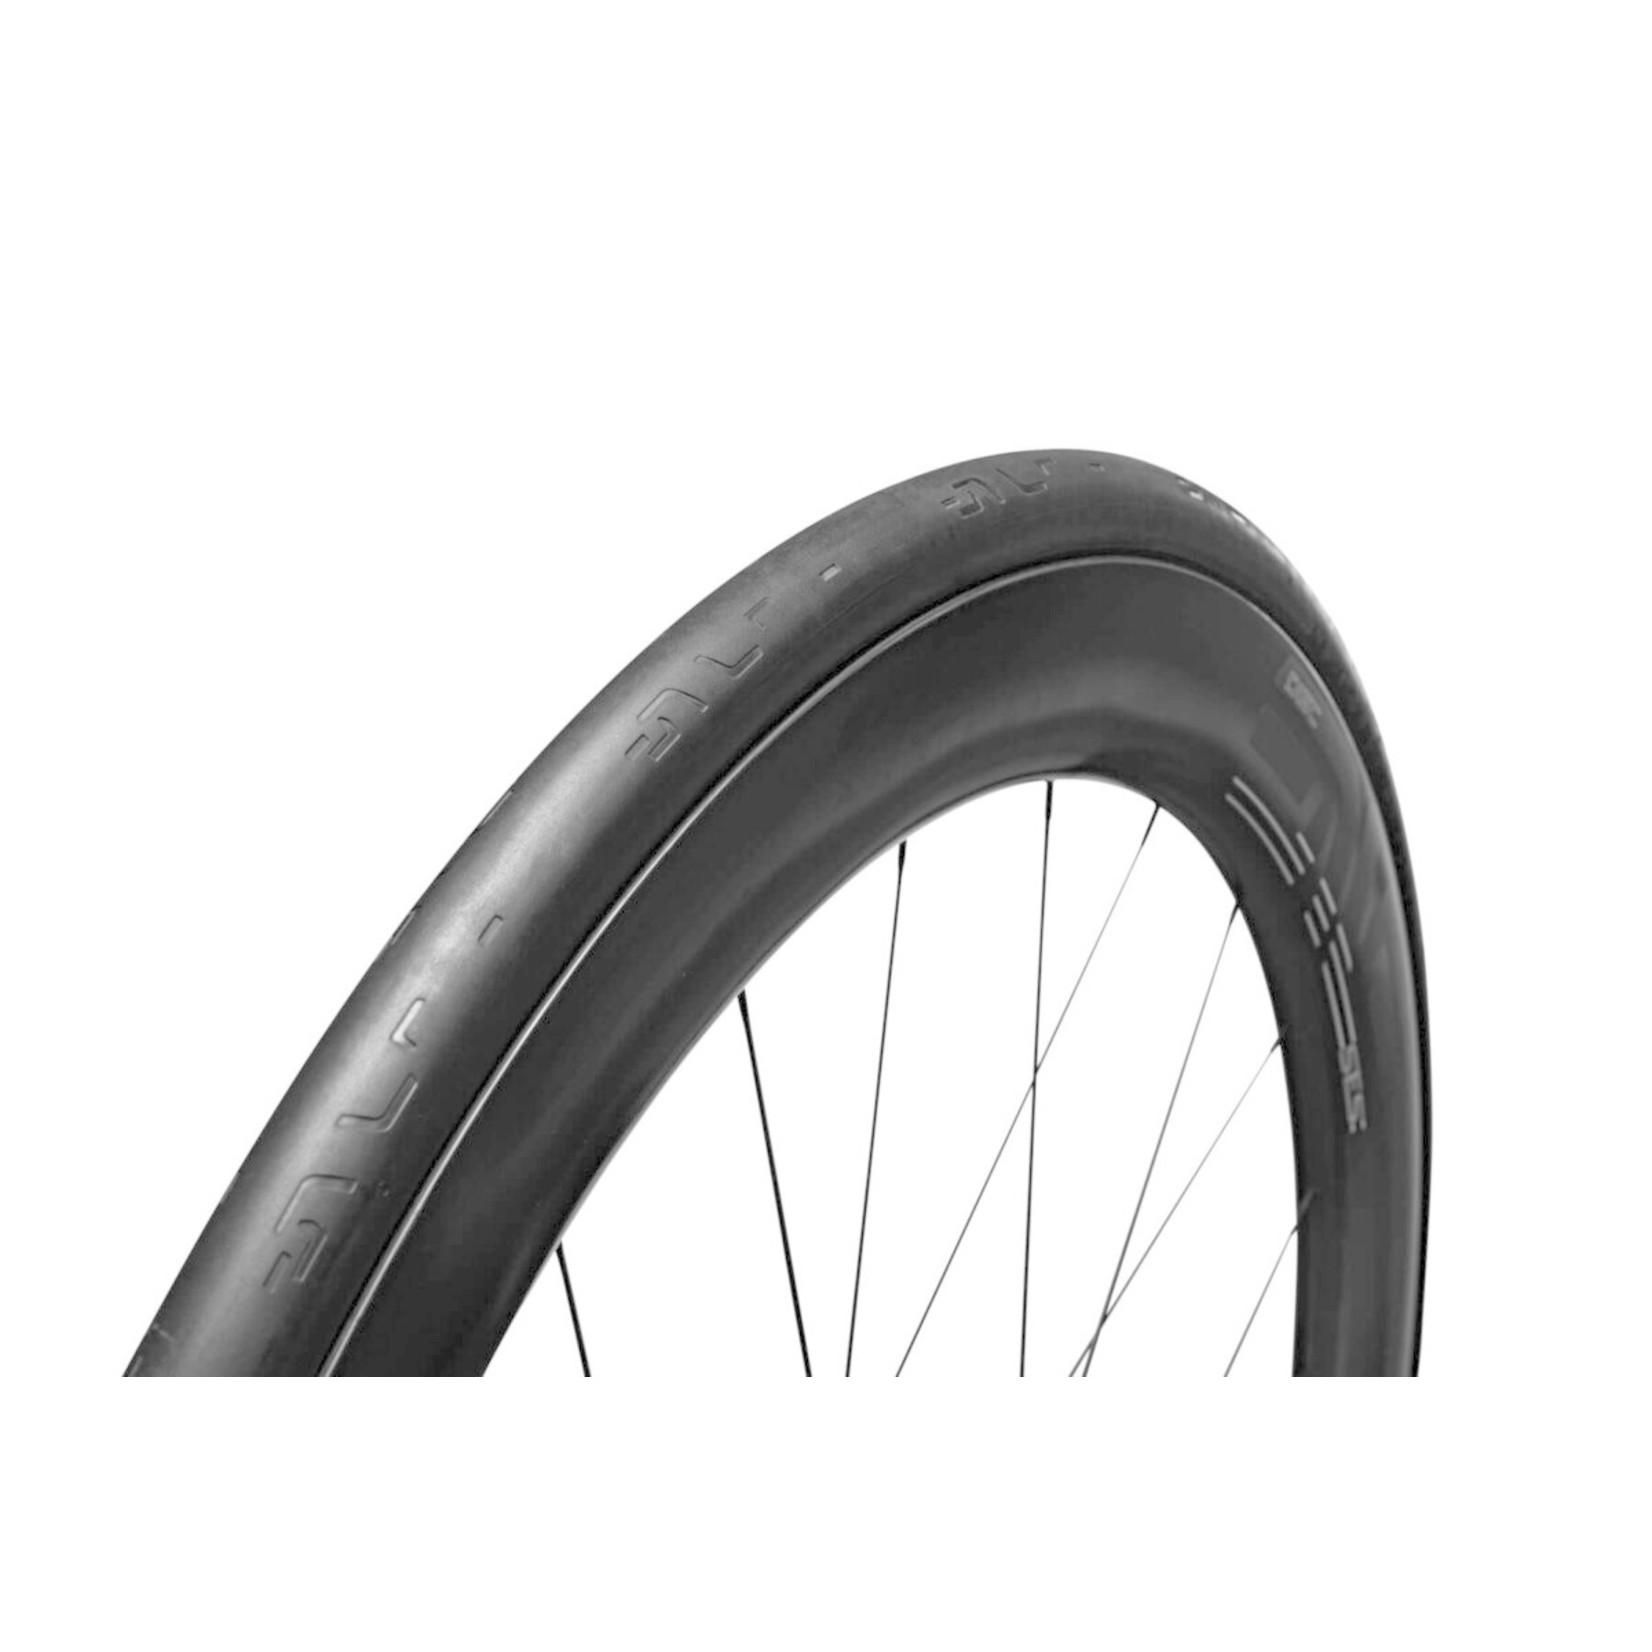 ENVE ENVE SES Road Tire 700x27mm Tubeless Ready